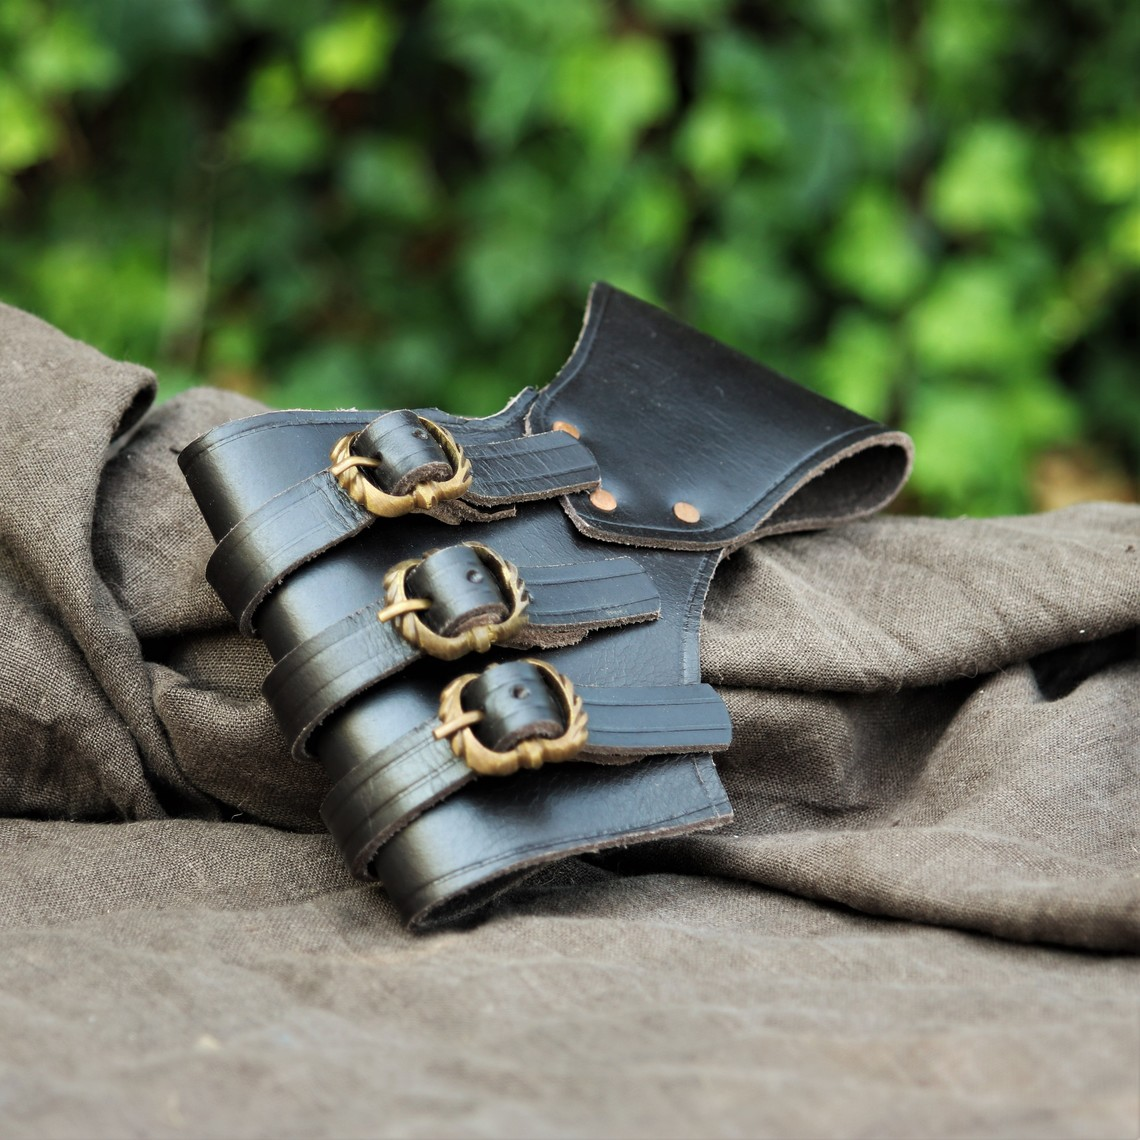 Ulfberth Losse zwaardfrog